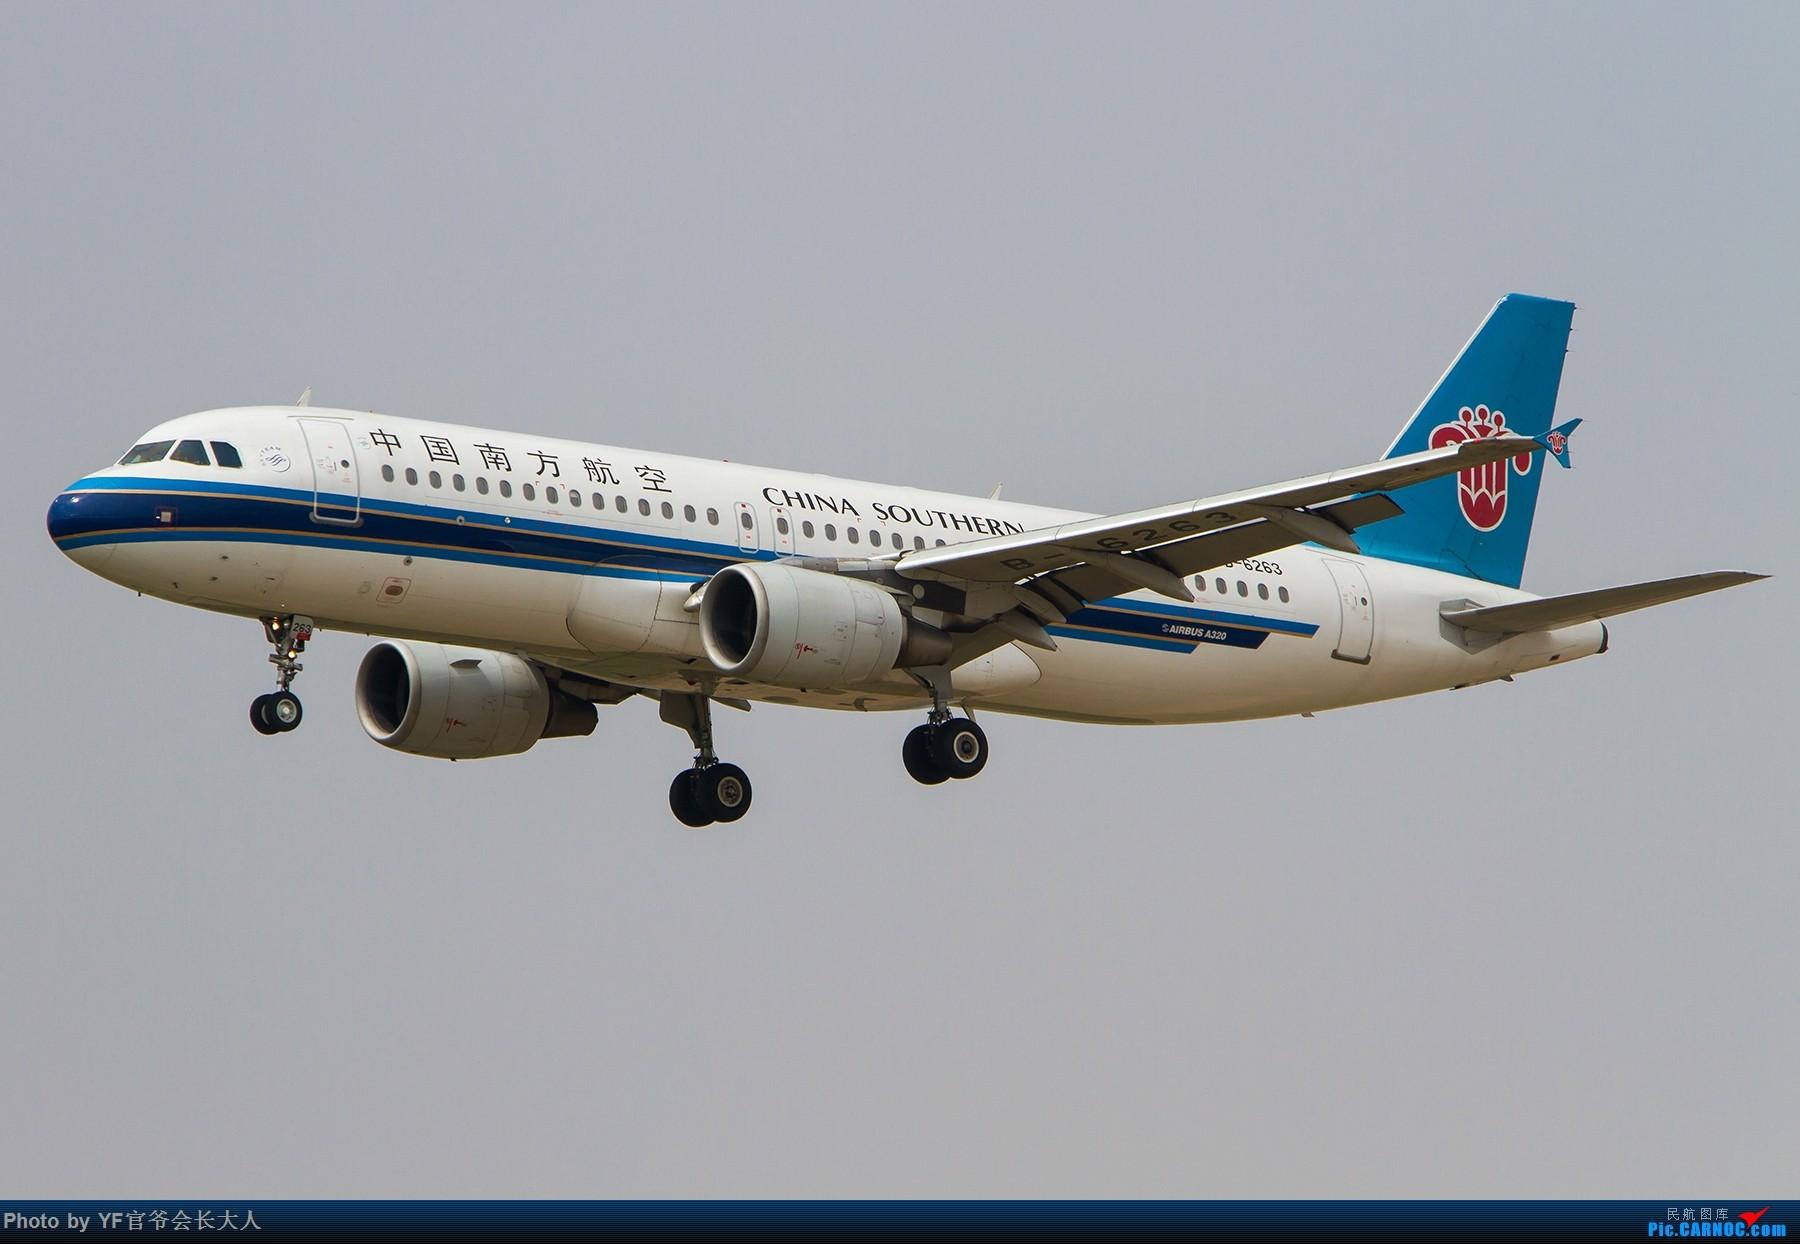 Re:[原创]【ZYTX】轻易不拍机,拍就要拍个过瘾!(新开的酷鸟,亚洲大西洋,顺带碰上朝韩两国的好货) AIRBUS A320-200 B-6263 中国沈阳桃仙国际机场